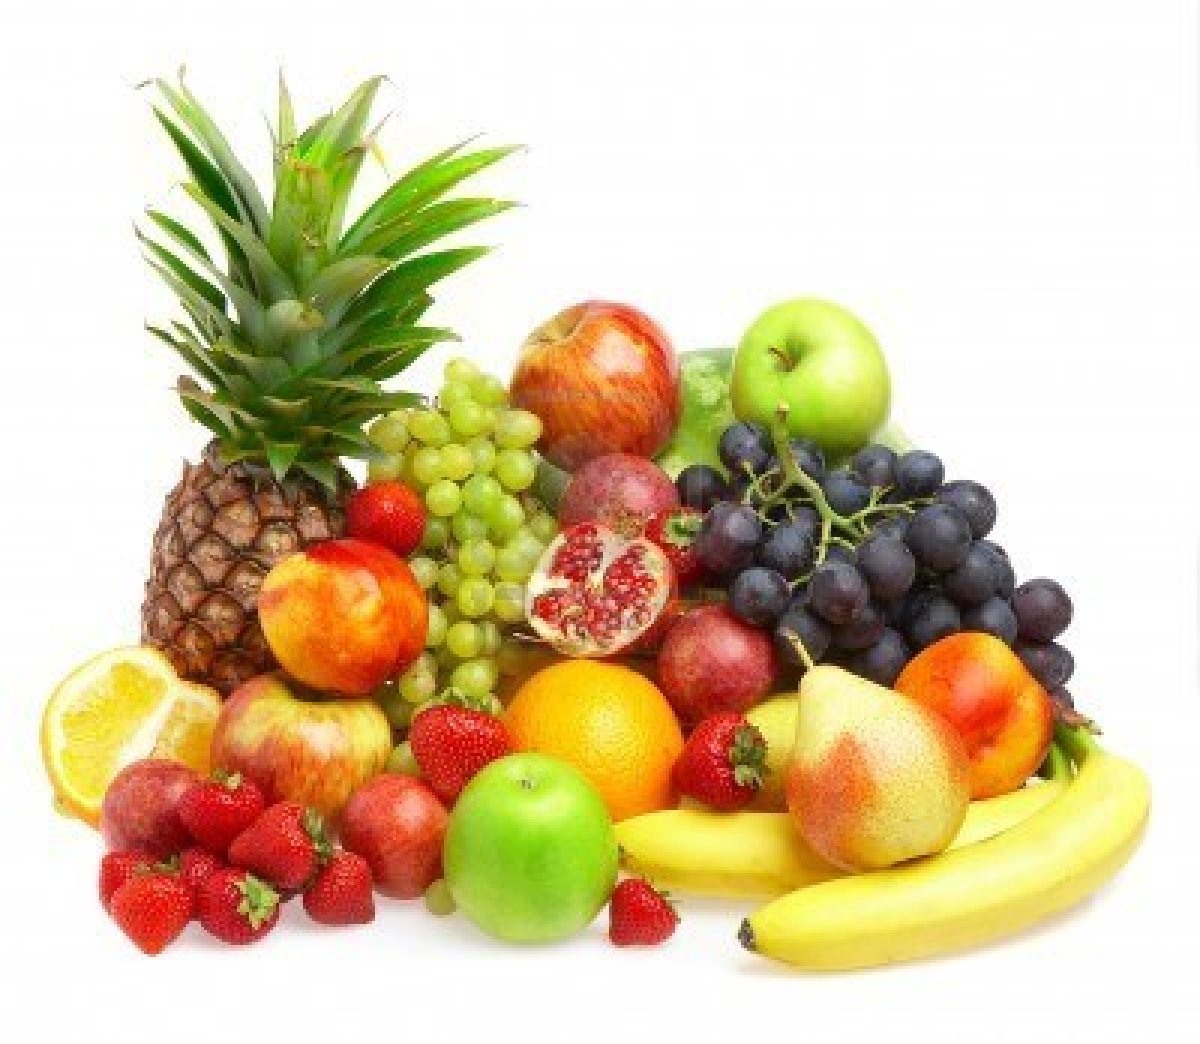 grapes apple banana guava stobery fresh fruit wallpaper hd 1200x1044